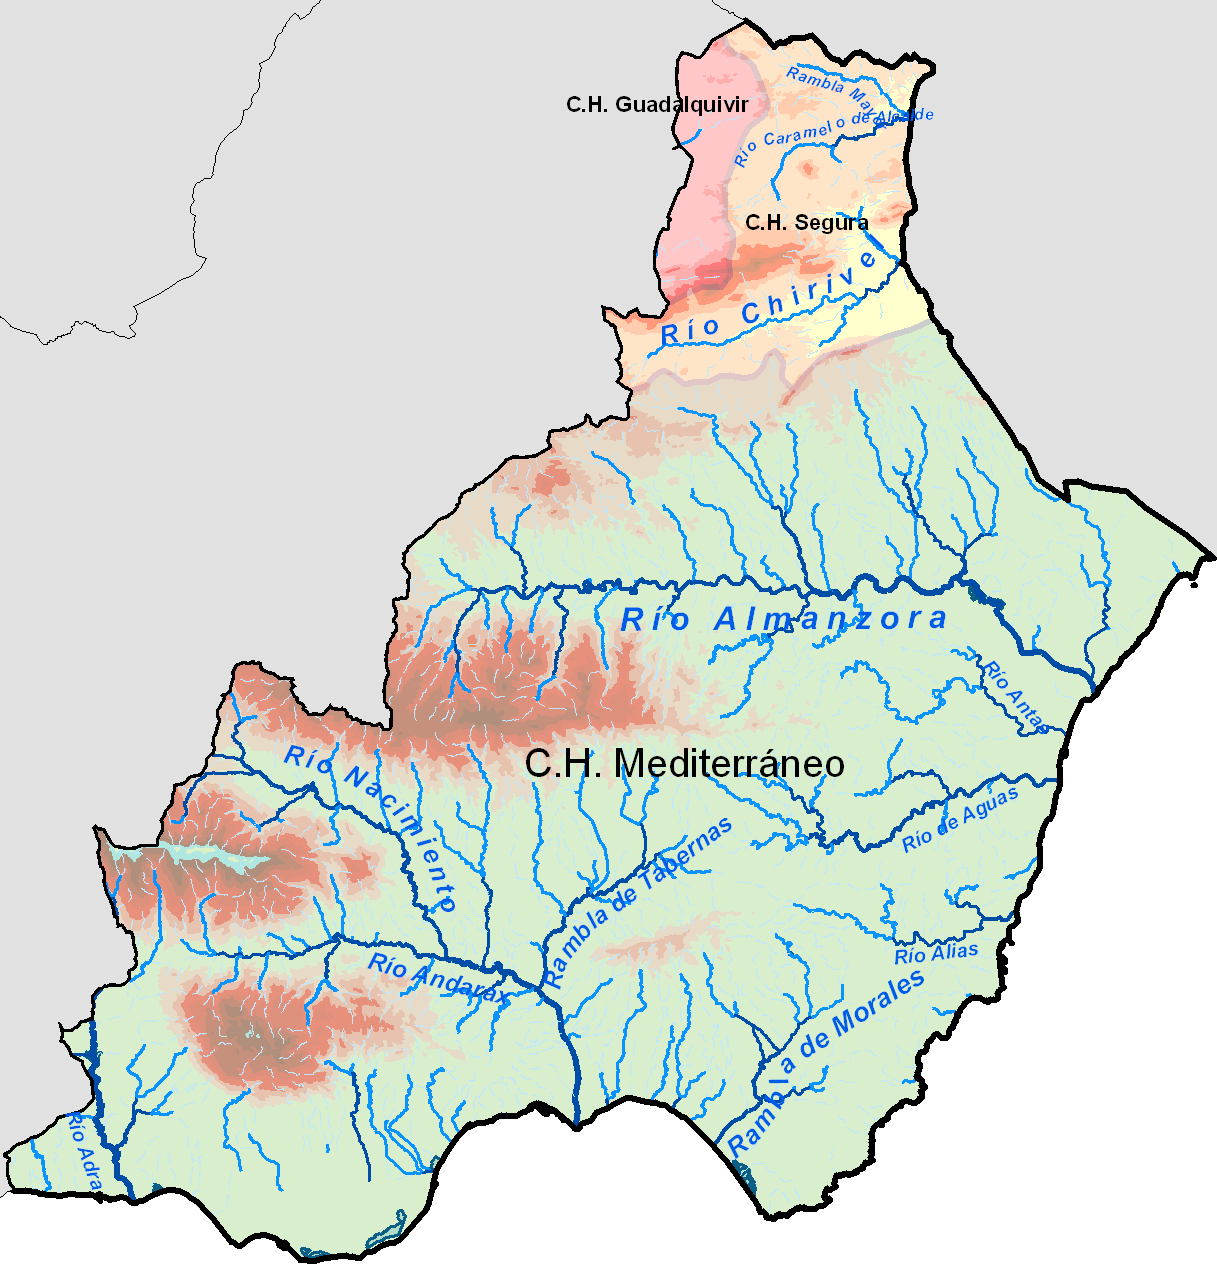 http://upload.wikimedia.org/wikipedia/commons/d/d8/Hidrografia_almeria.png